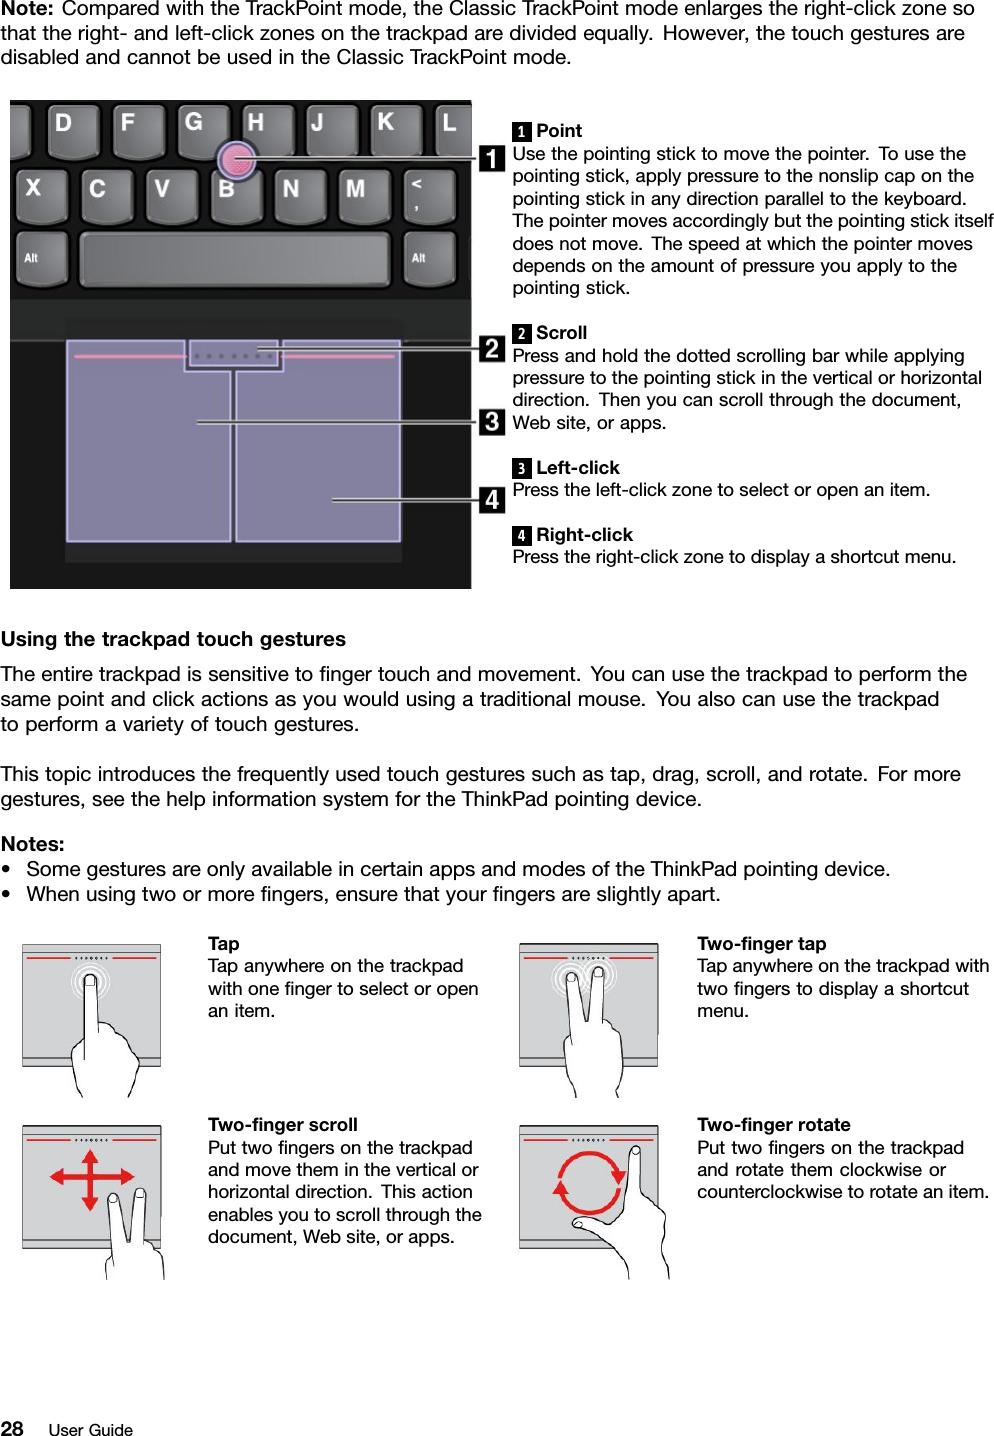 Lenovo T440 Ug En ThinkPad User Manual (English) Guide Laptop (Think